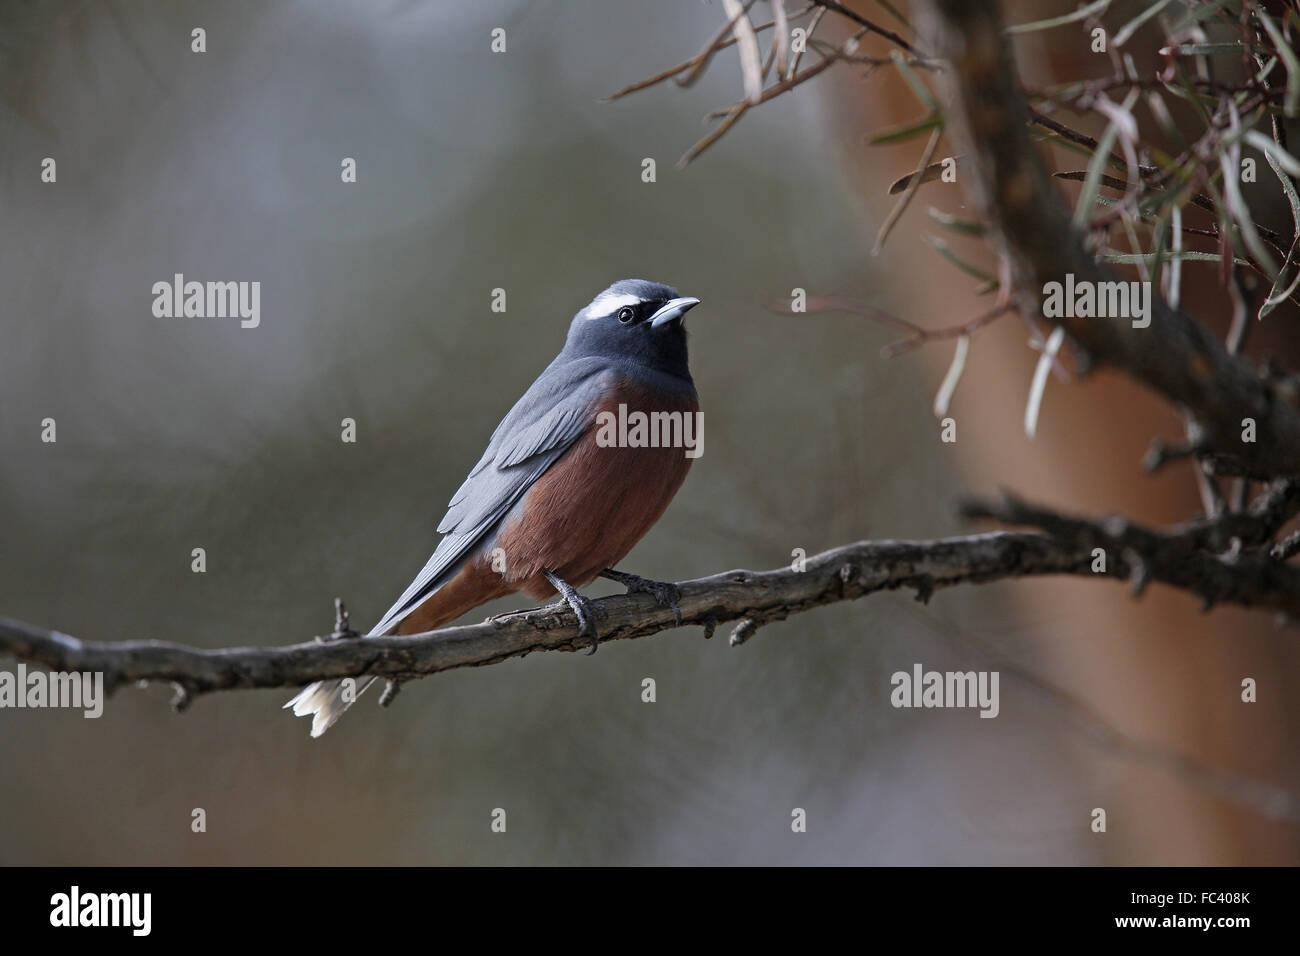 White-browed Woodswallow, Artamus superciliosus - Stock Image